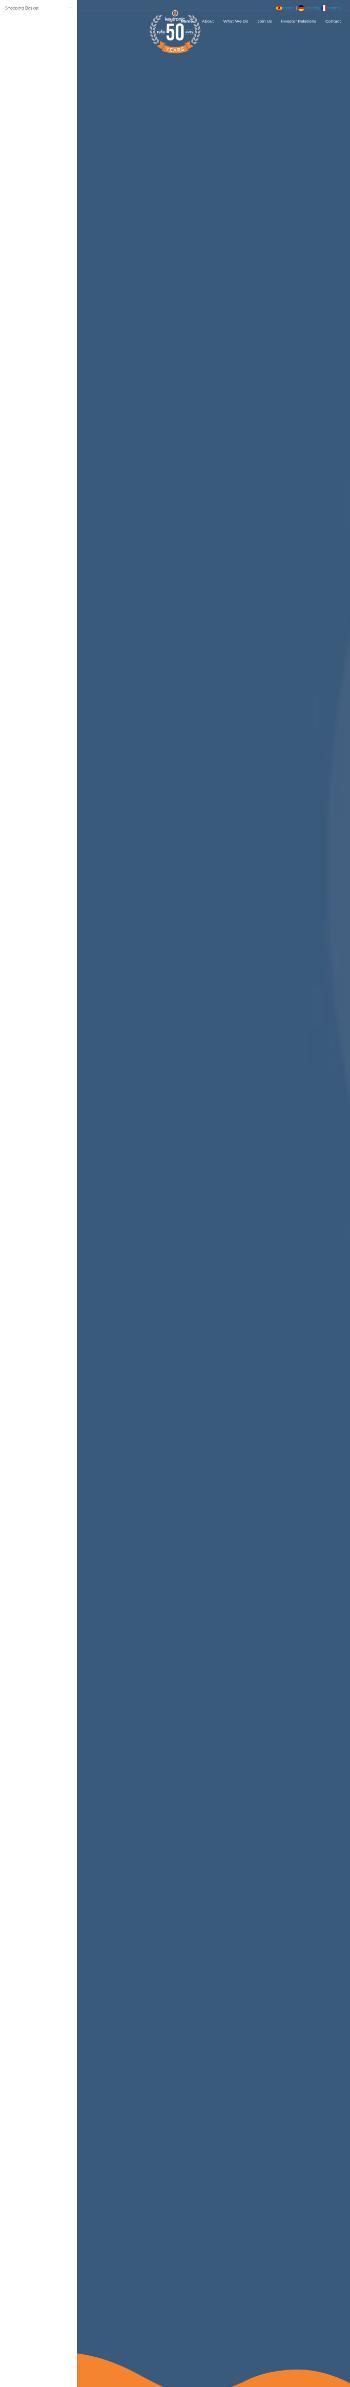 Key Tronic Corporation Website Screenshot